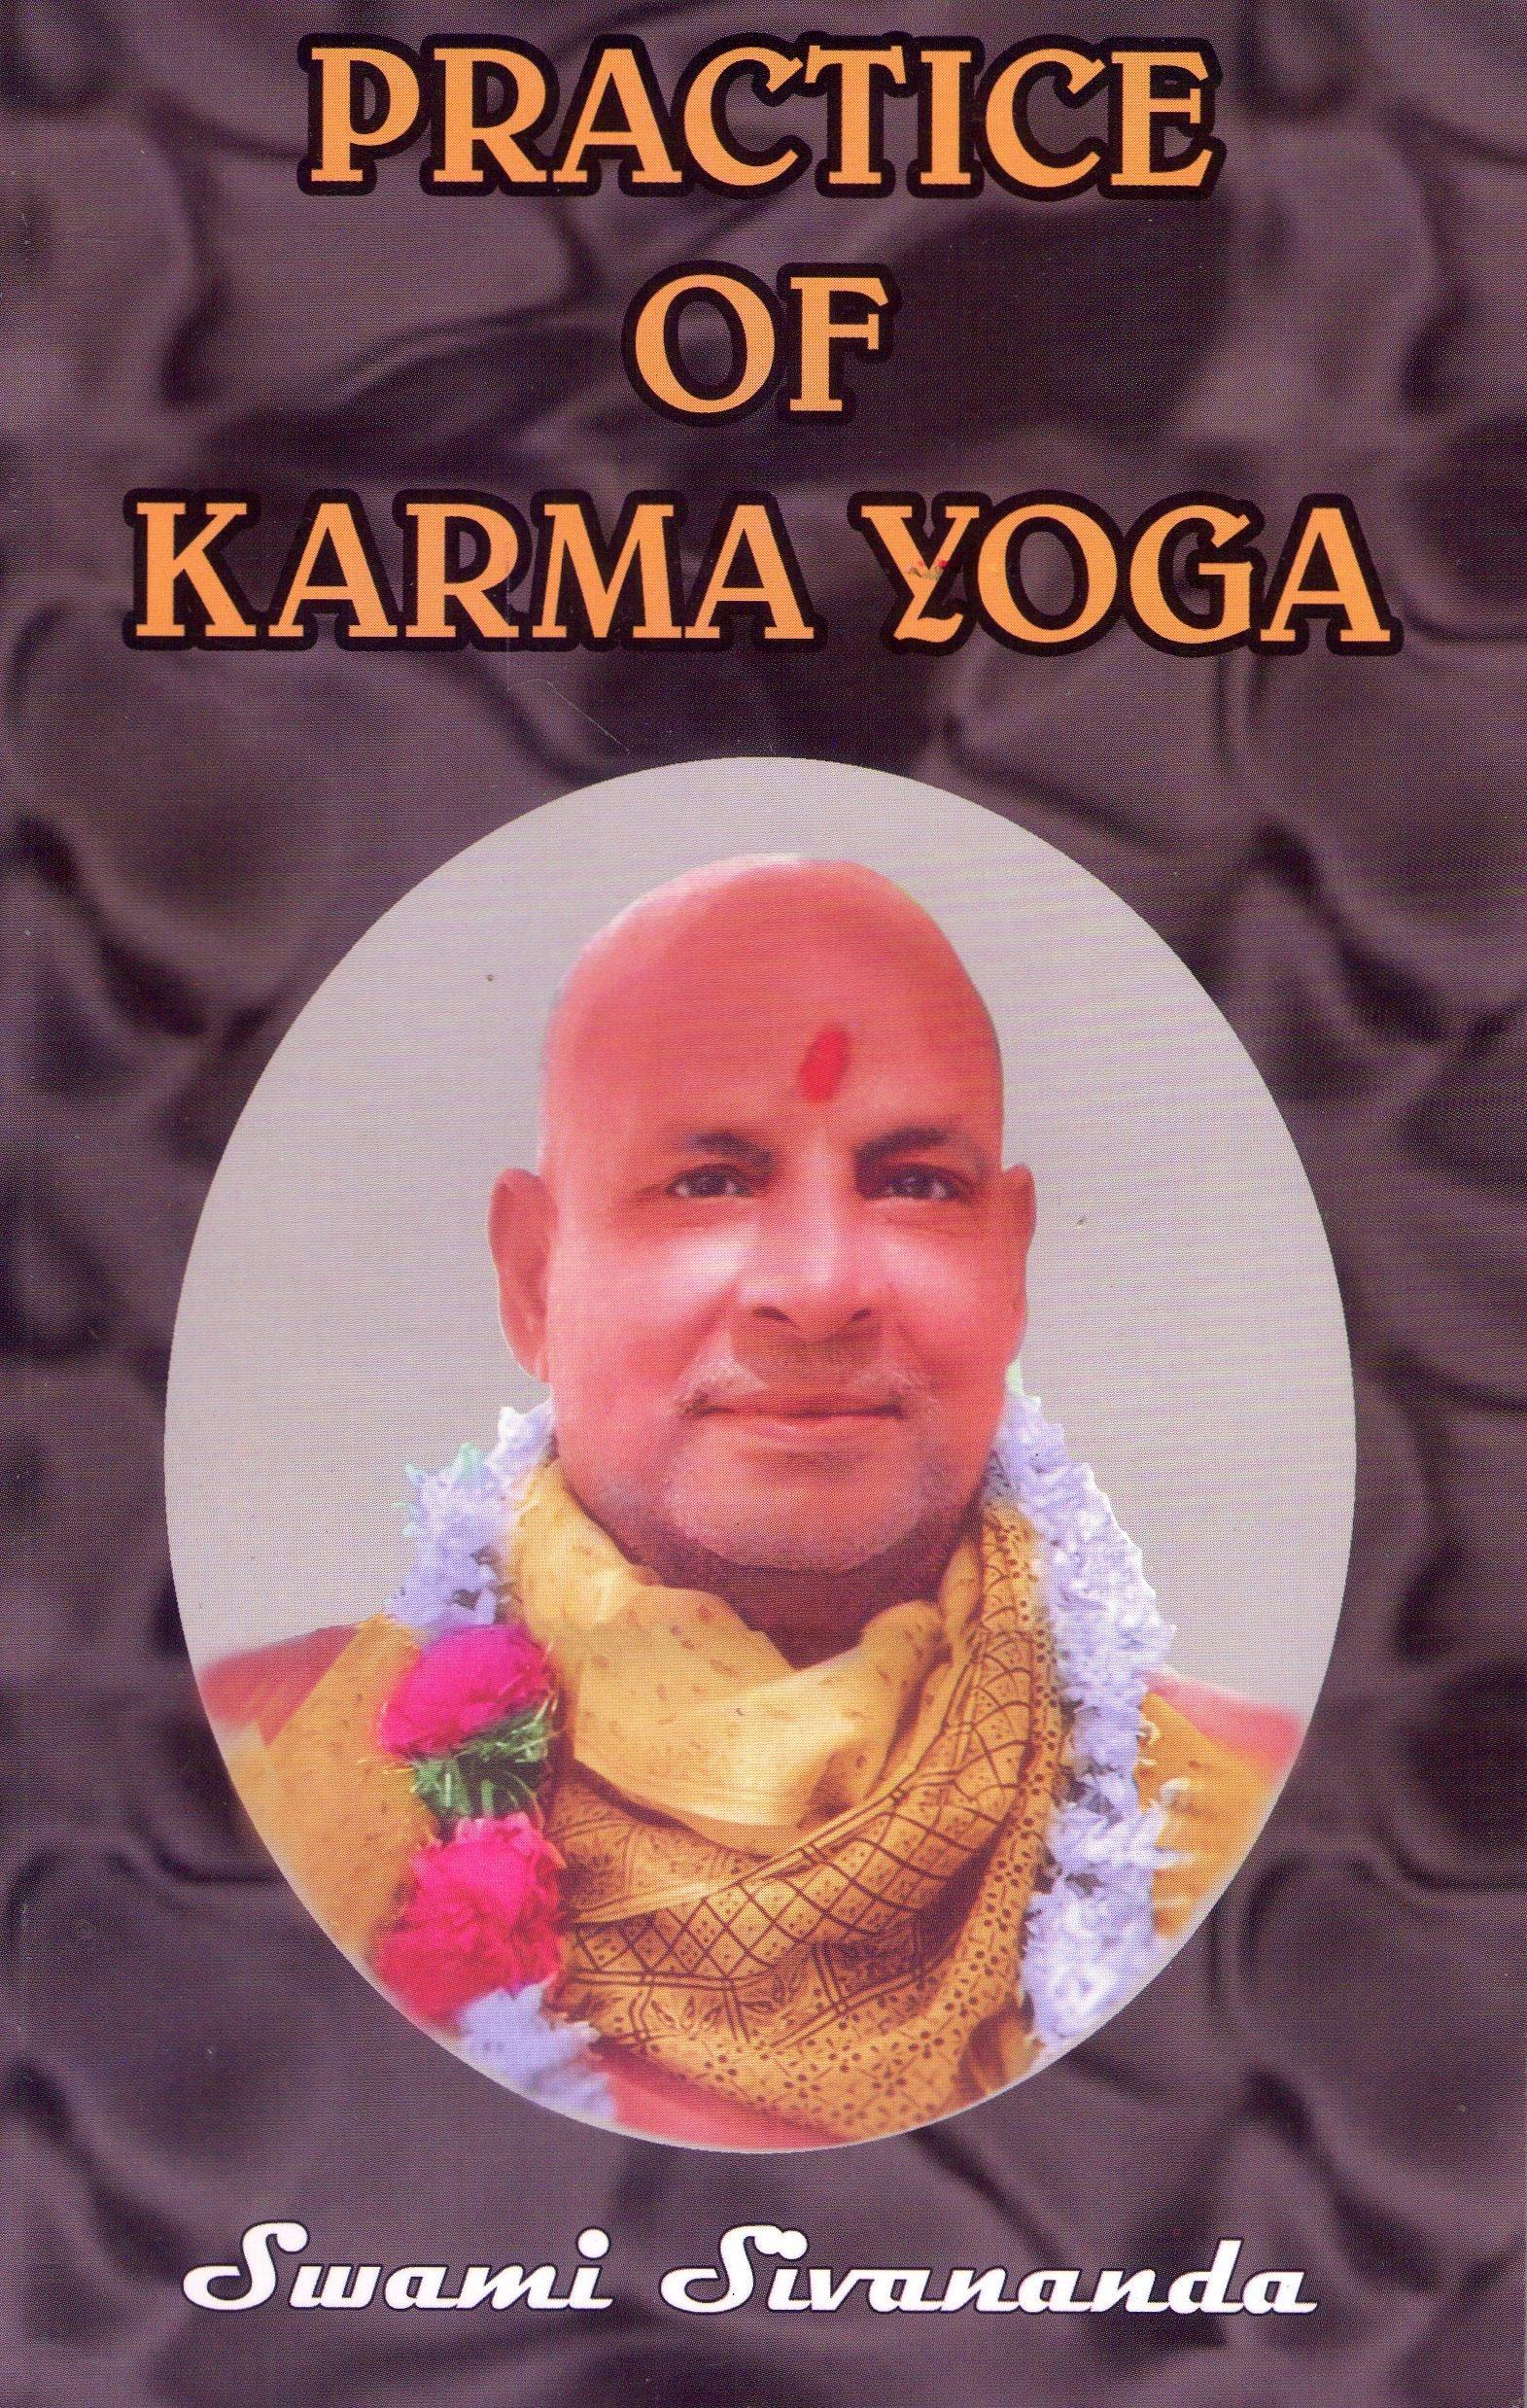 Practice Of Karma Yoga Swami Sivananda 9788170520146 Amazon Books